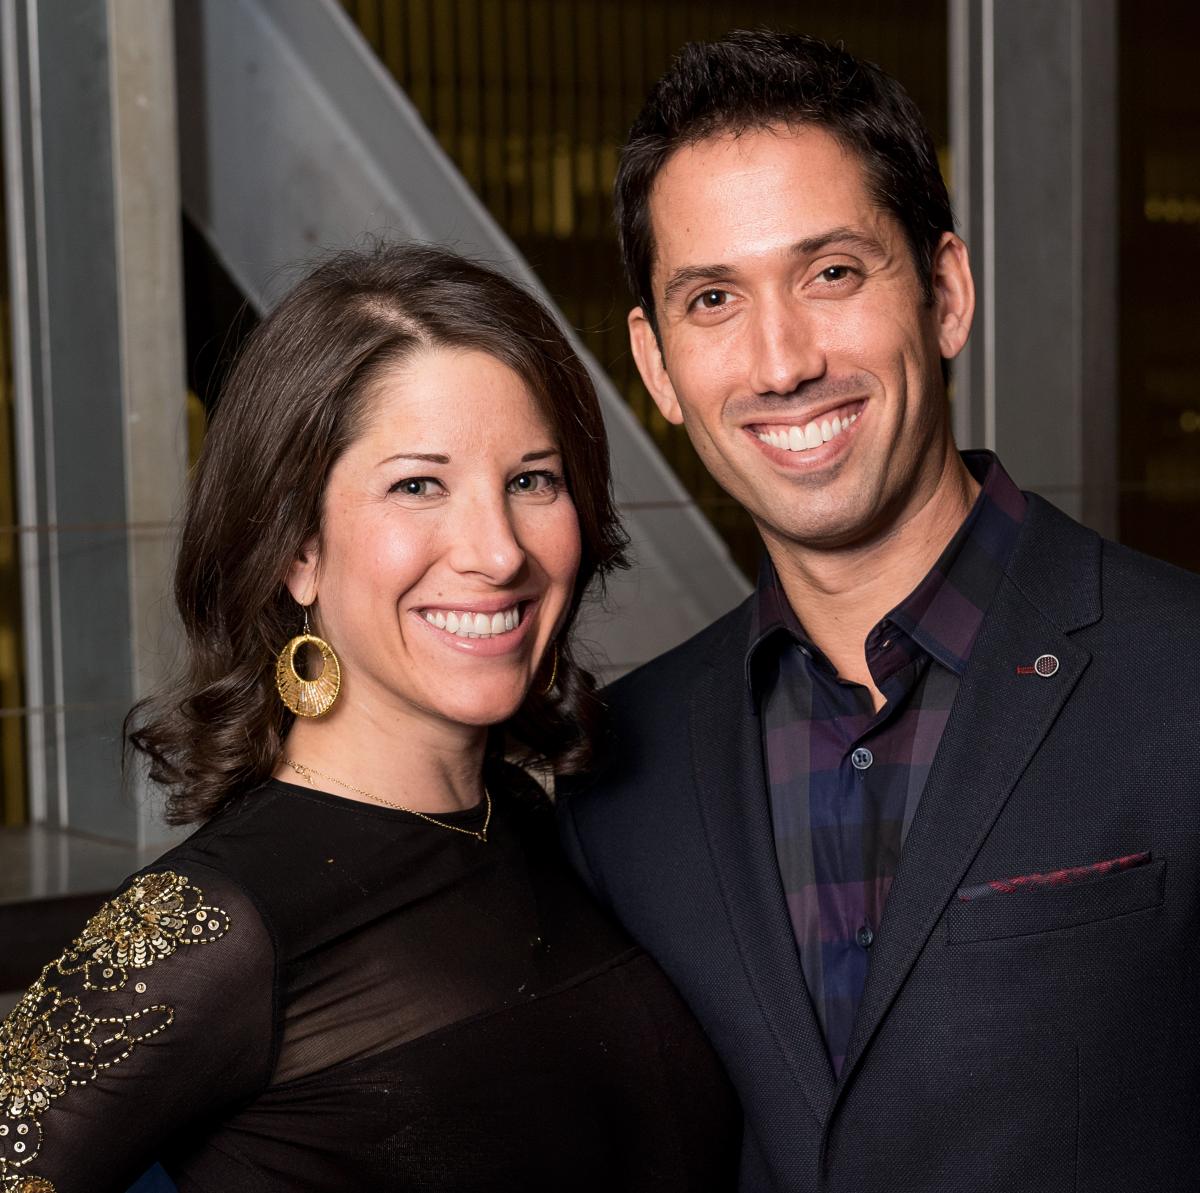 News, NCJW gala, Nov. 2015, Esther Freedman, Doug Freedman